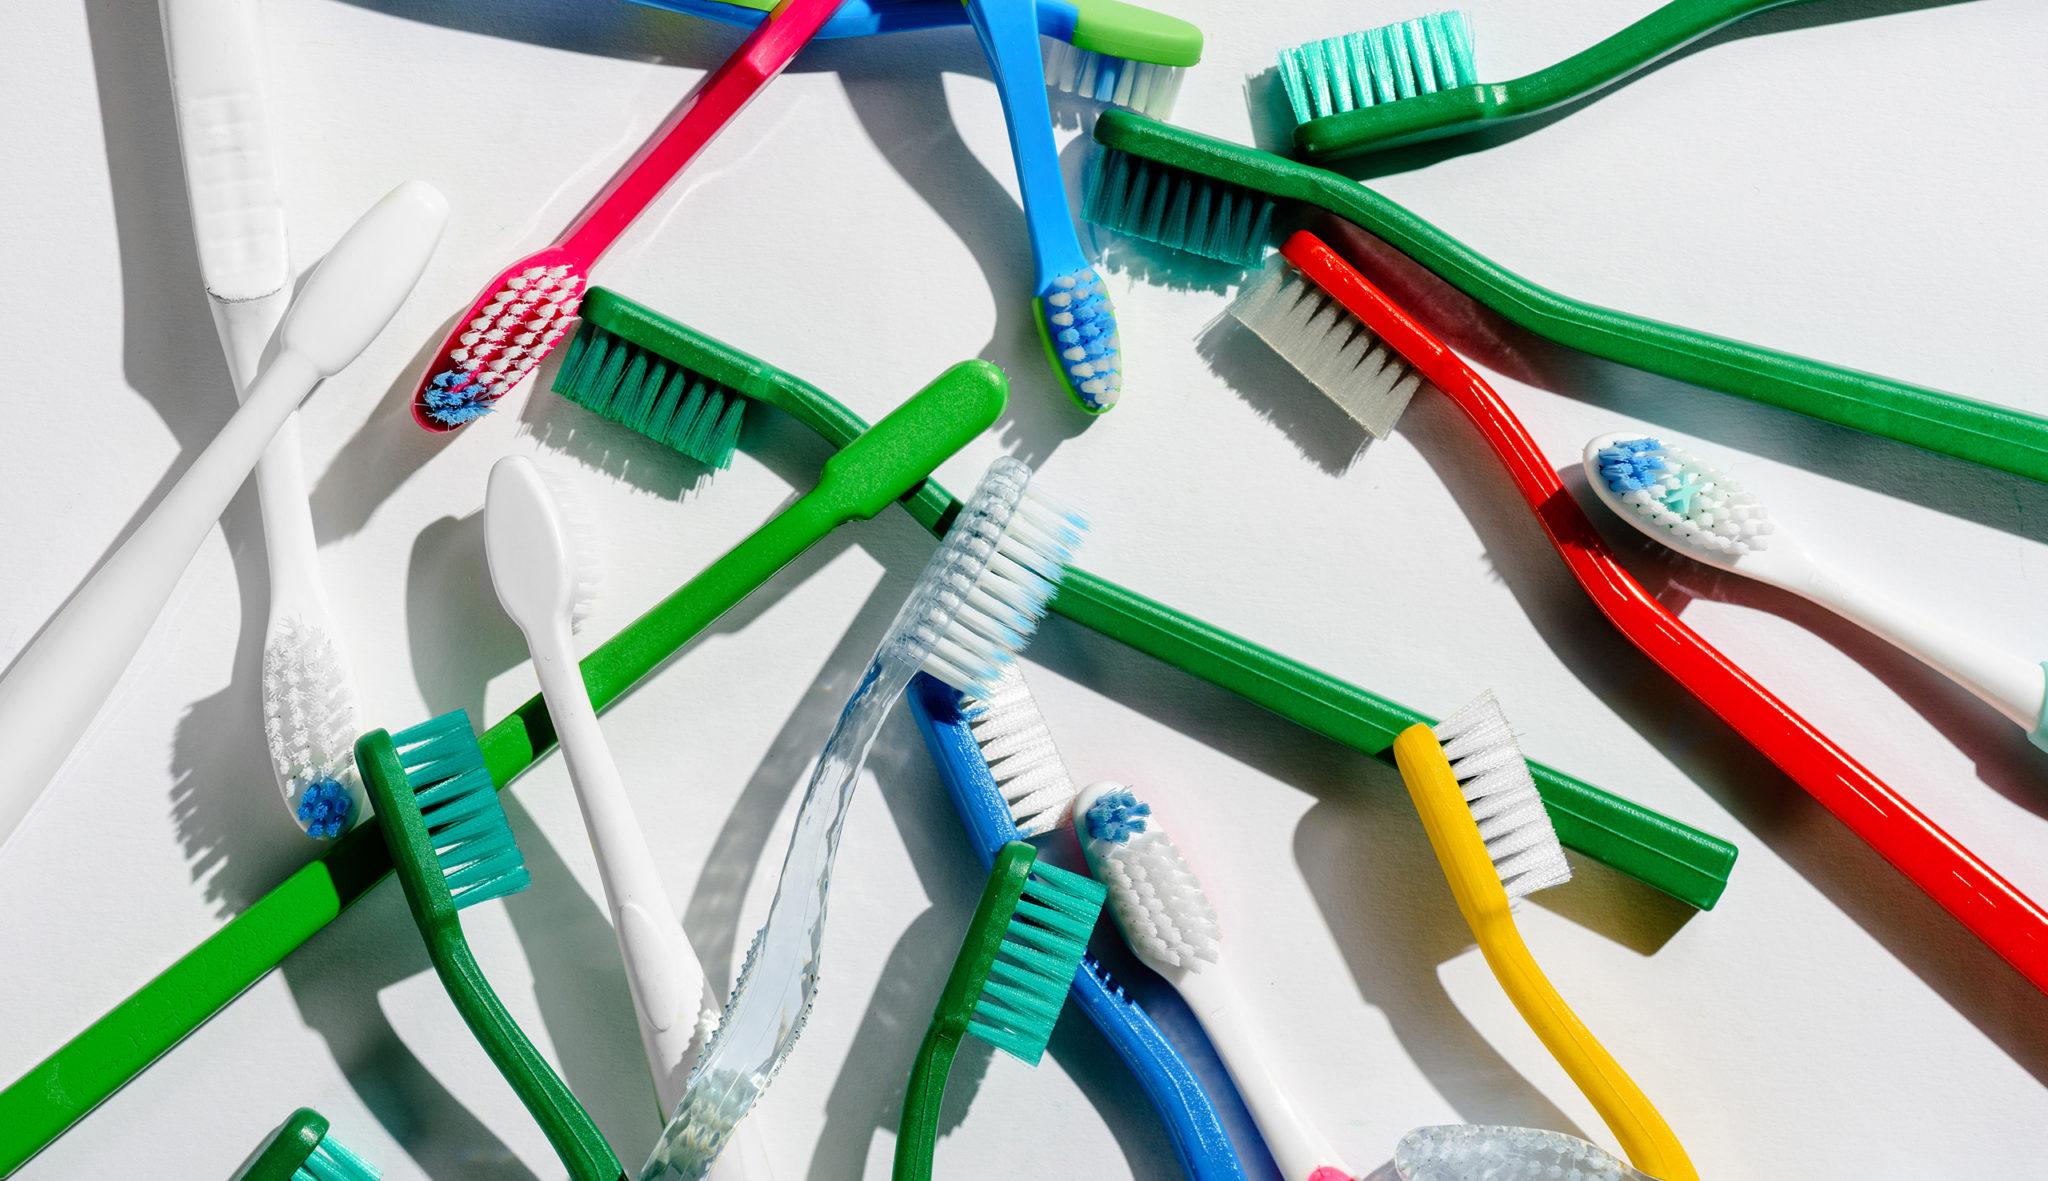 Conoce la importancia de tu cepillo dental